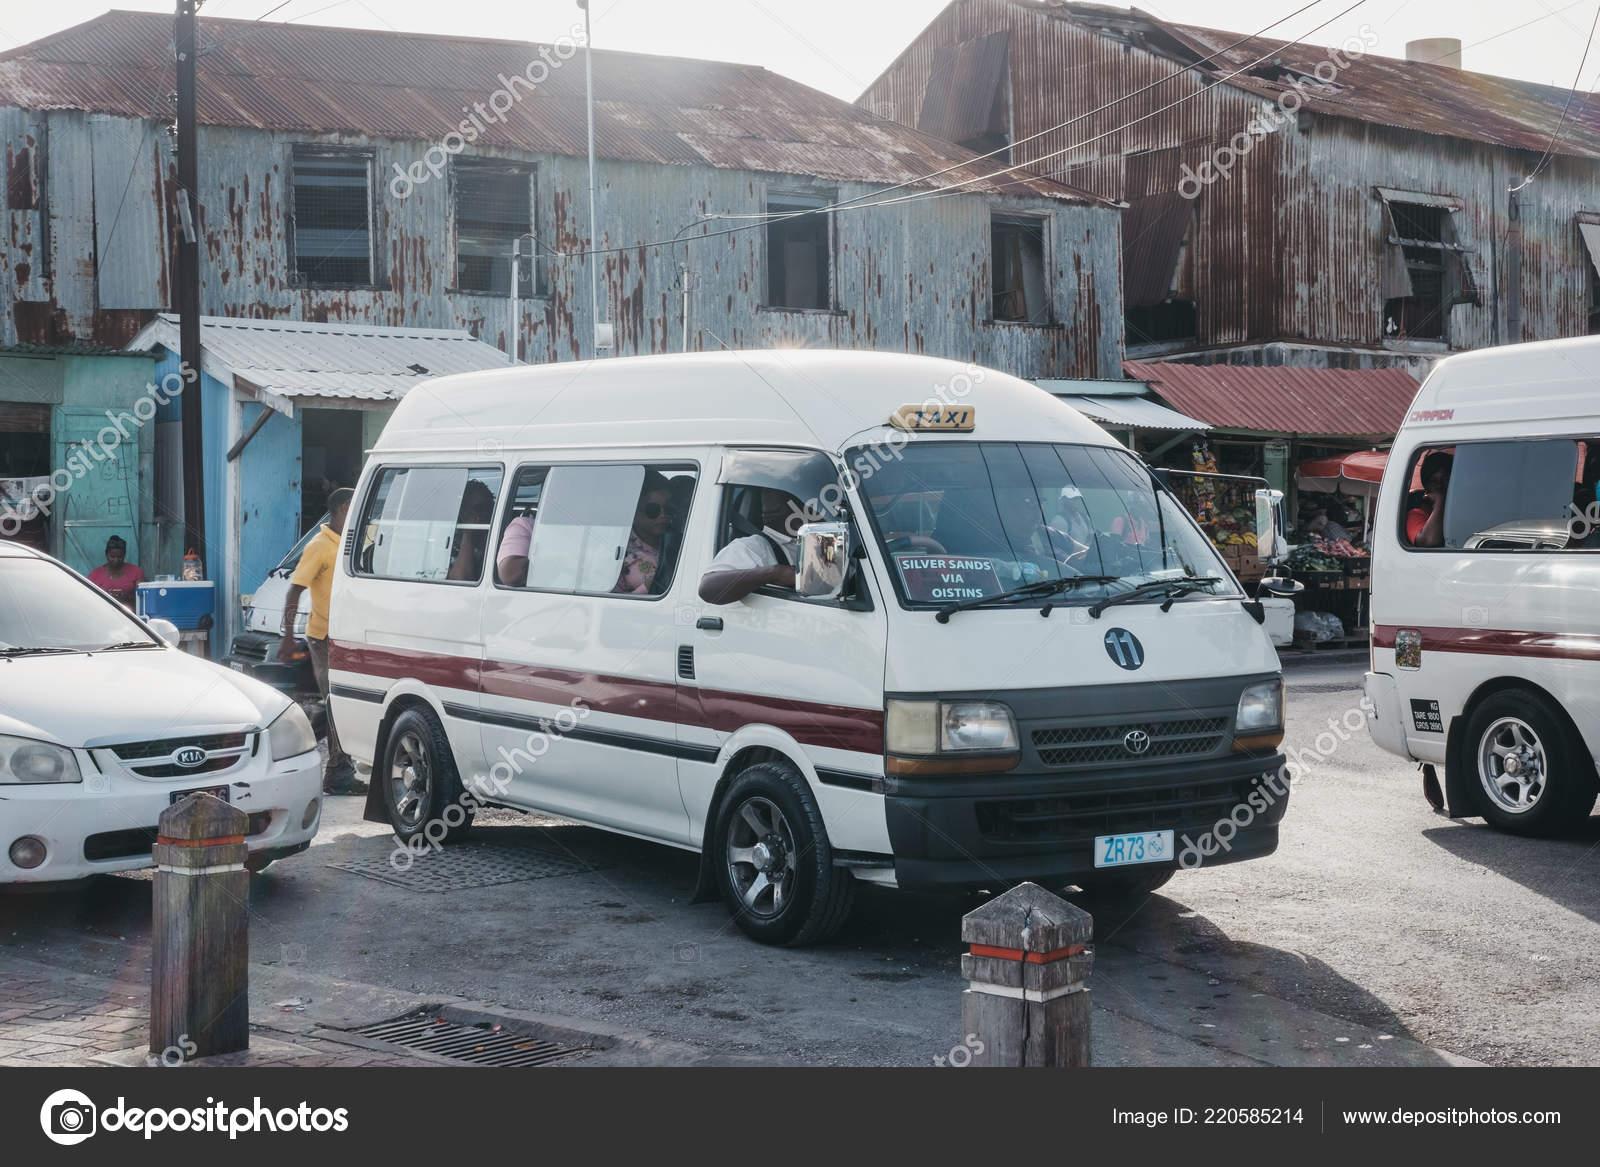 2d2c2332fa Bridgetown Barbados June 2018 Private White Mini Buses Parked Outdoor —  Stock Photo